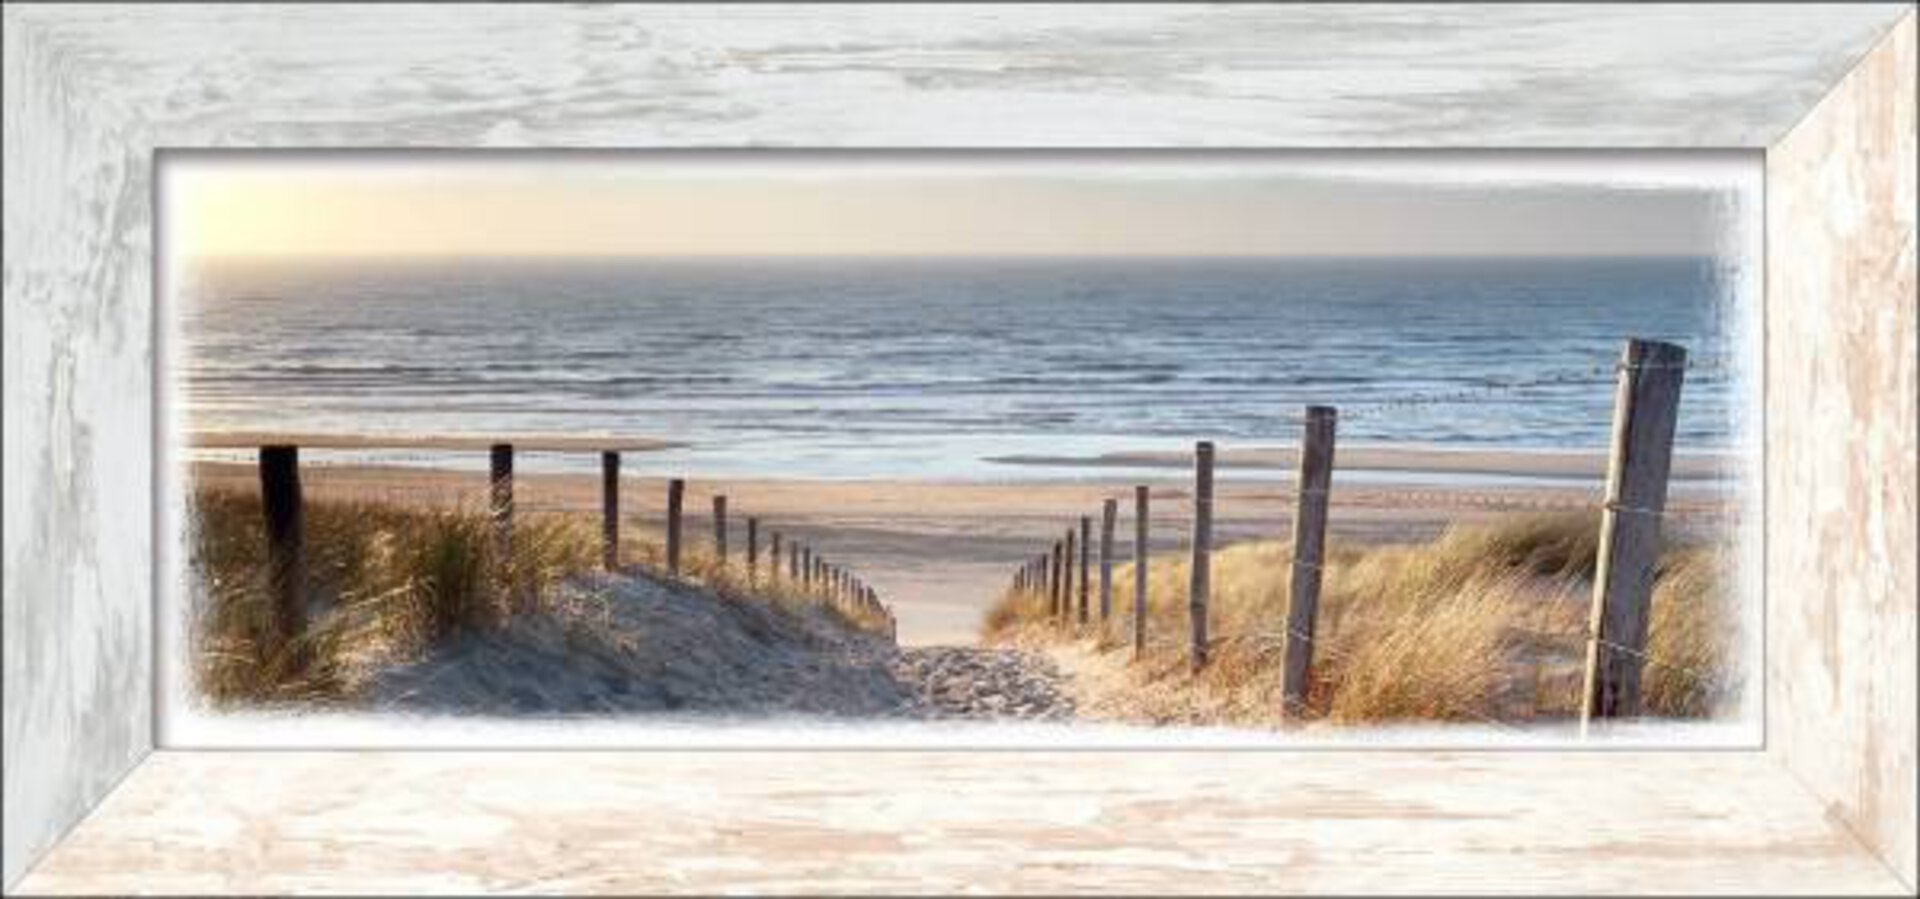 Bild Nautic Mare I Pro-Art Holzwerkstoff mehrfarbig 94 x 44 x 1 cm